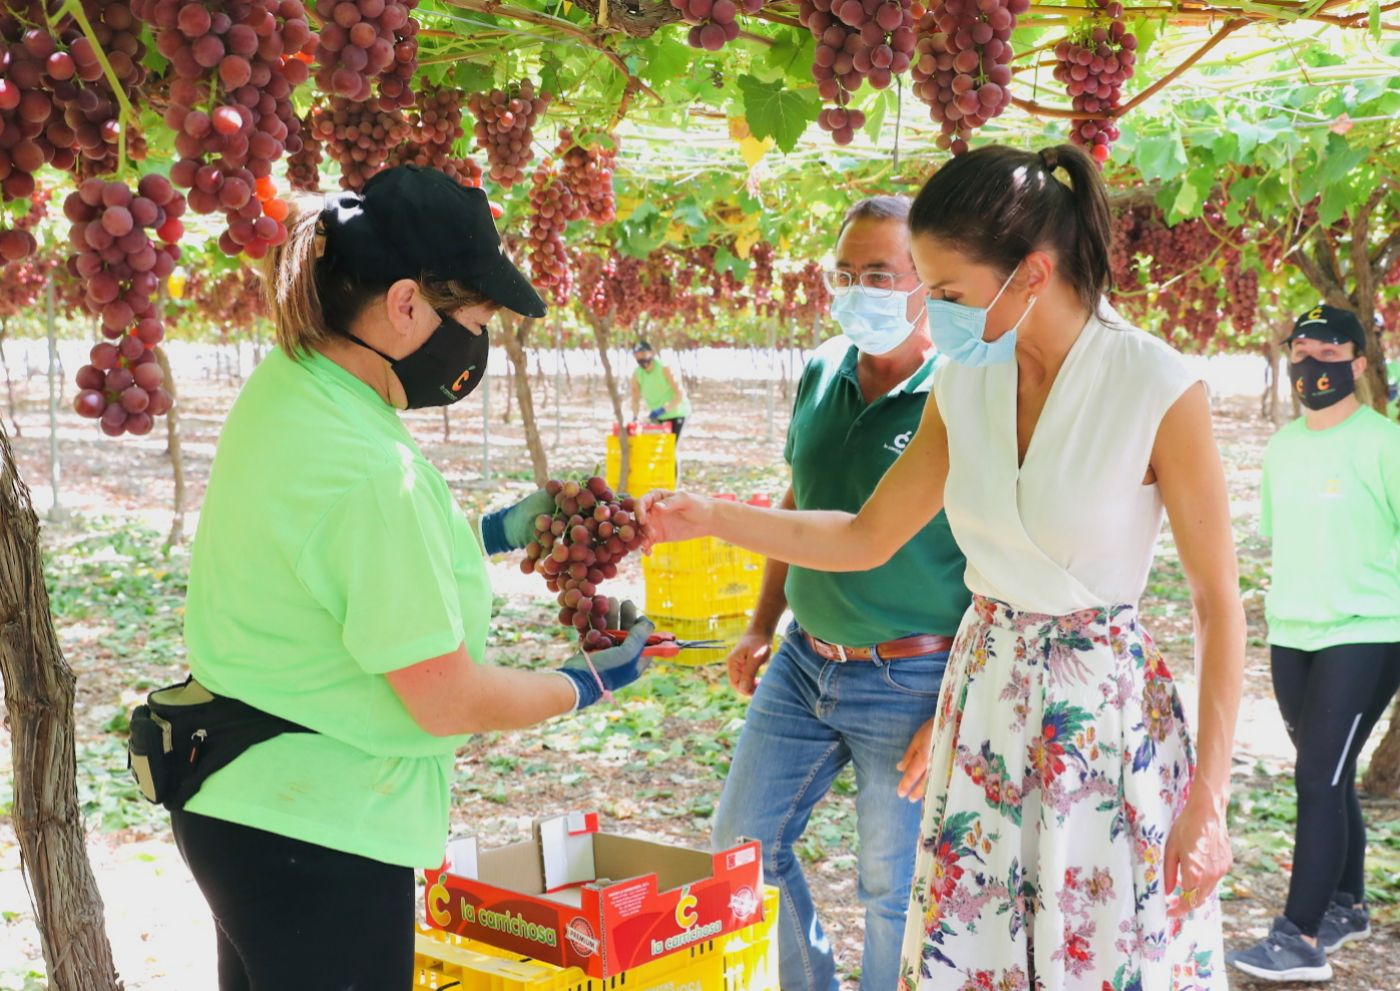 La reina charlando con María, recolectora de uva en <strong>Murcia</strong>.